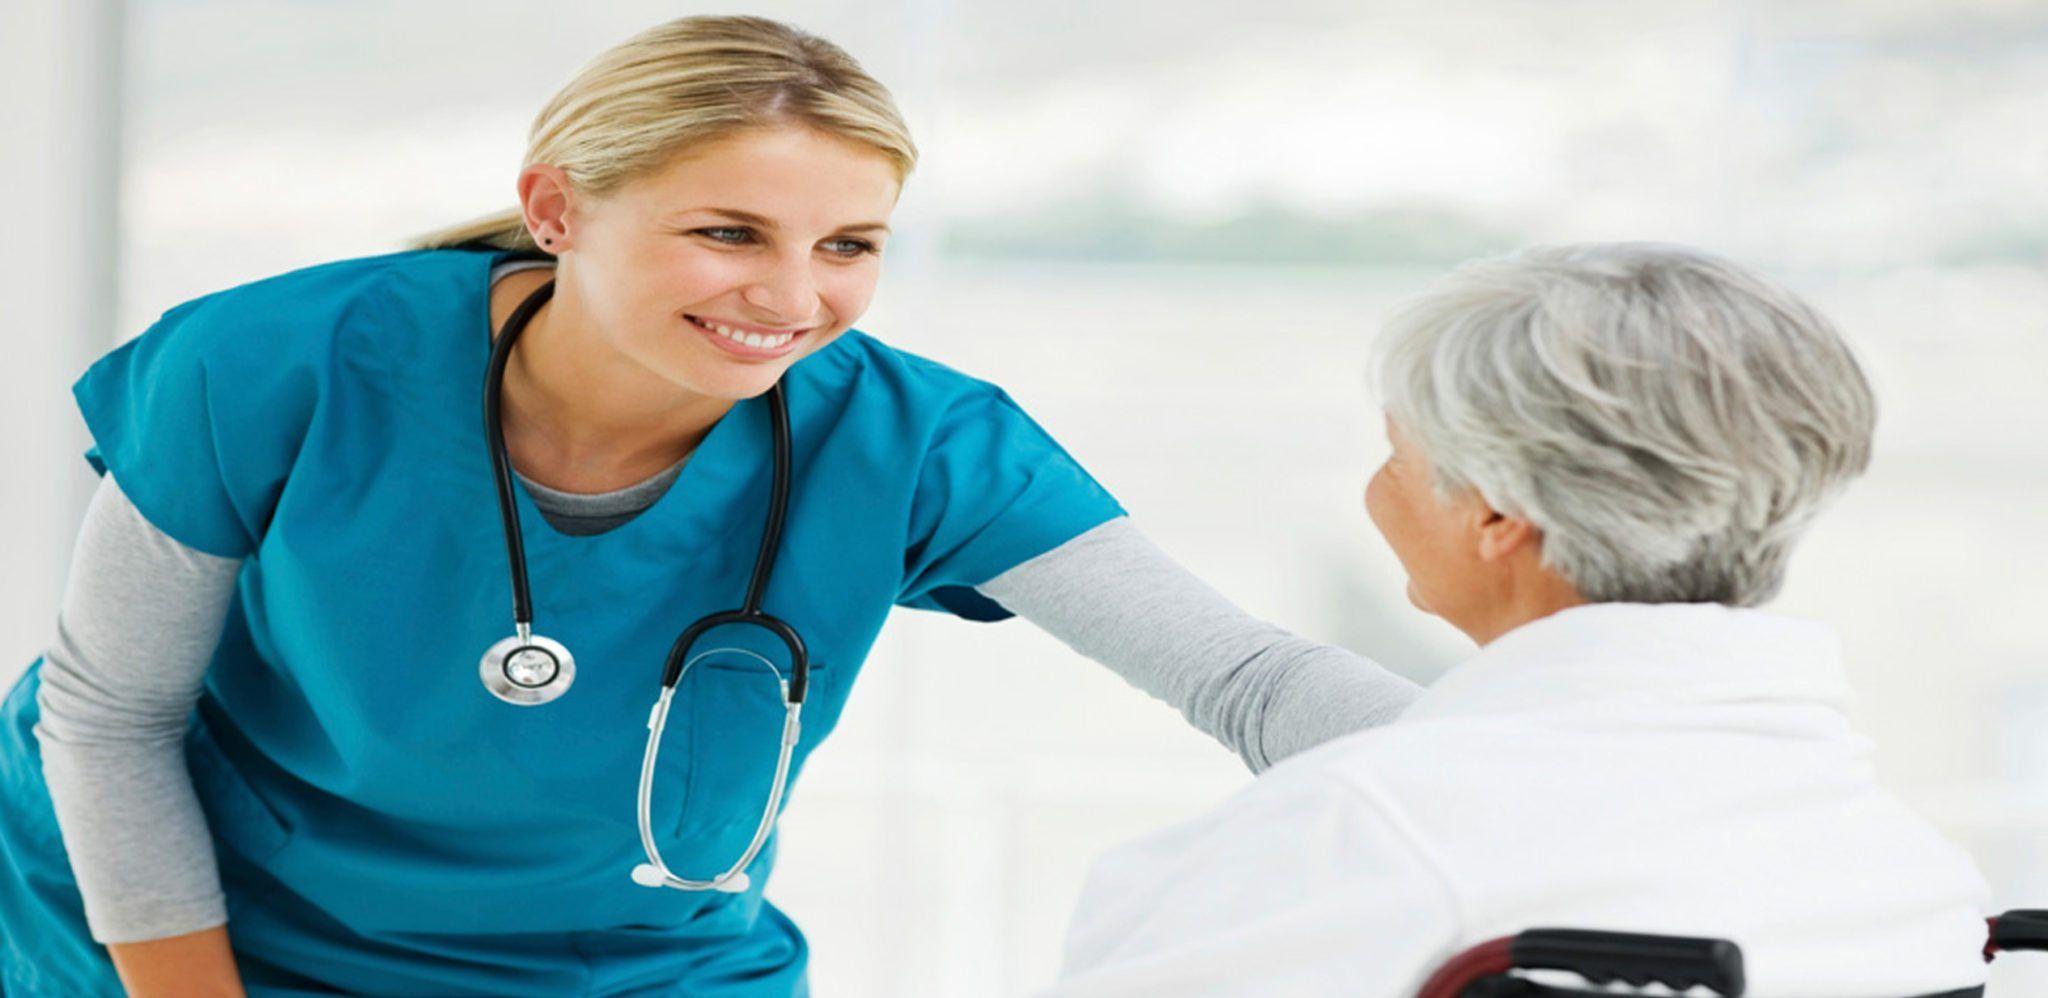 Its Your Arthritis, You Can Take Control Nursing jobs